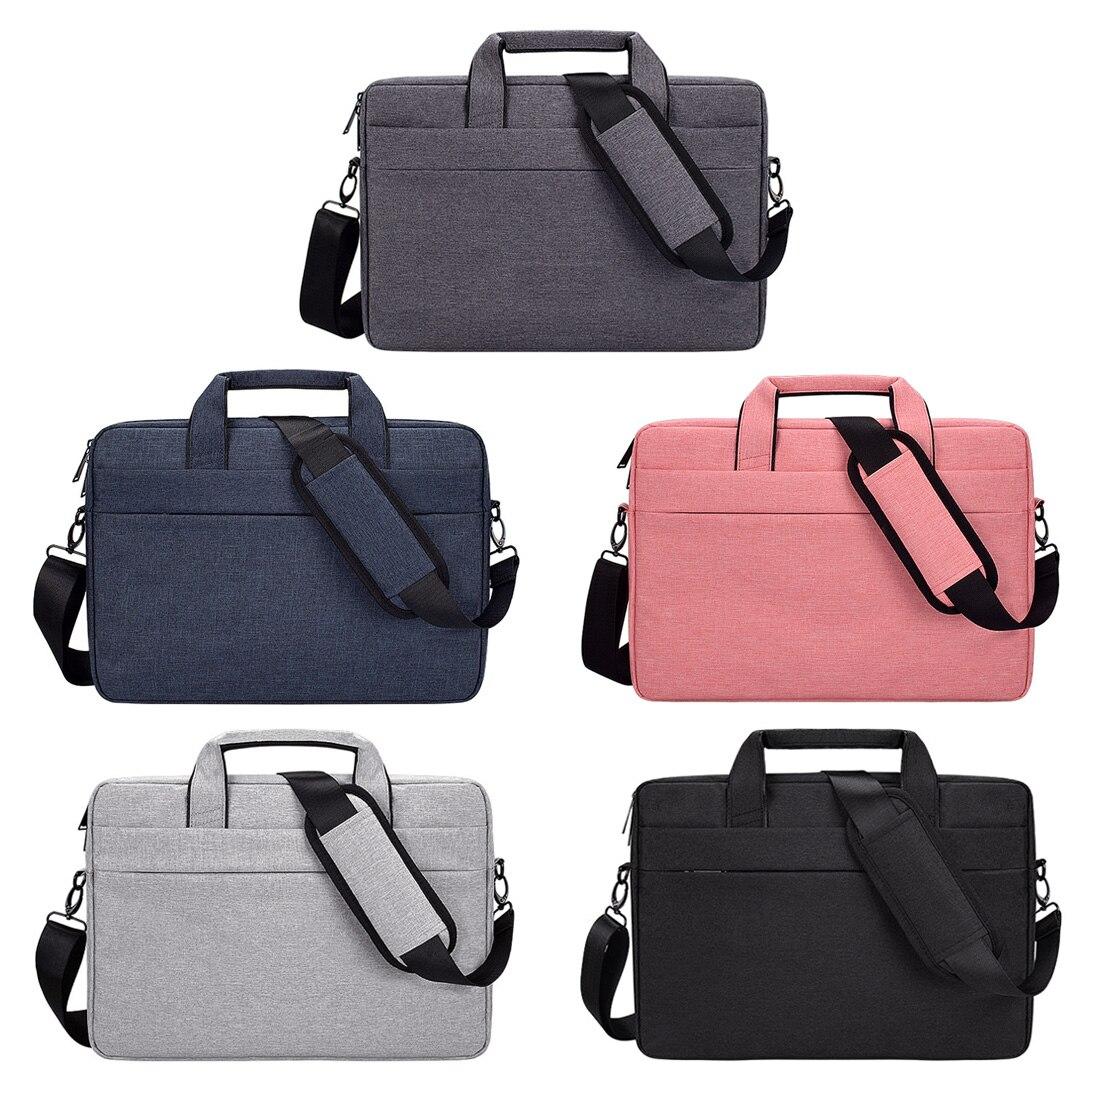 Shockproof Bag Case For font b Apple b font font b Macbook b font Air Pro